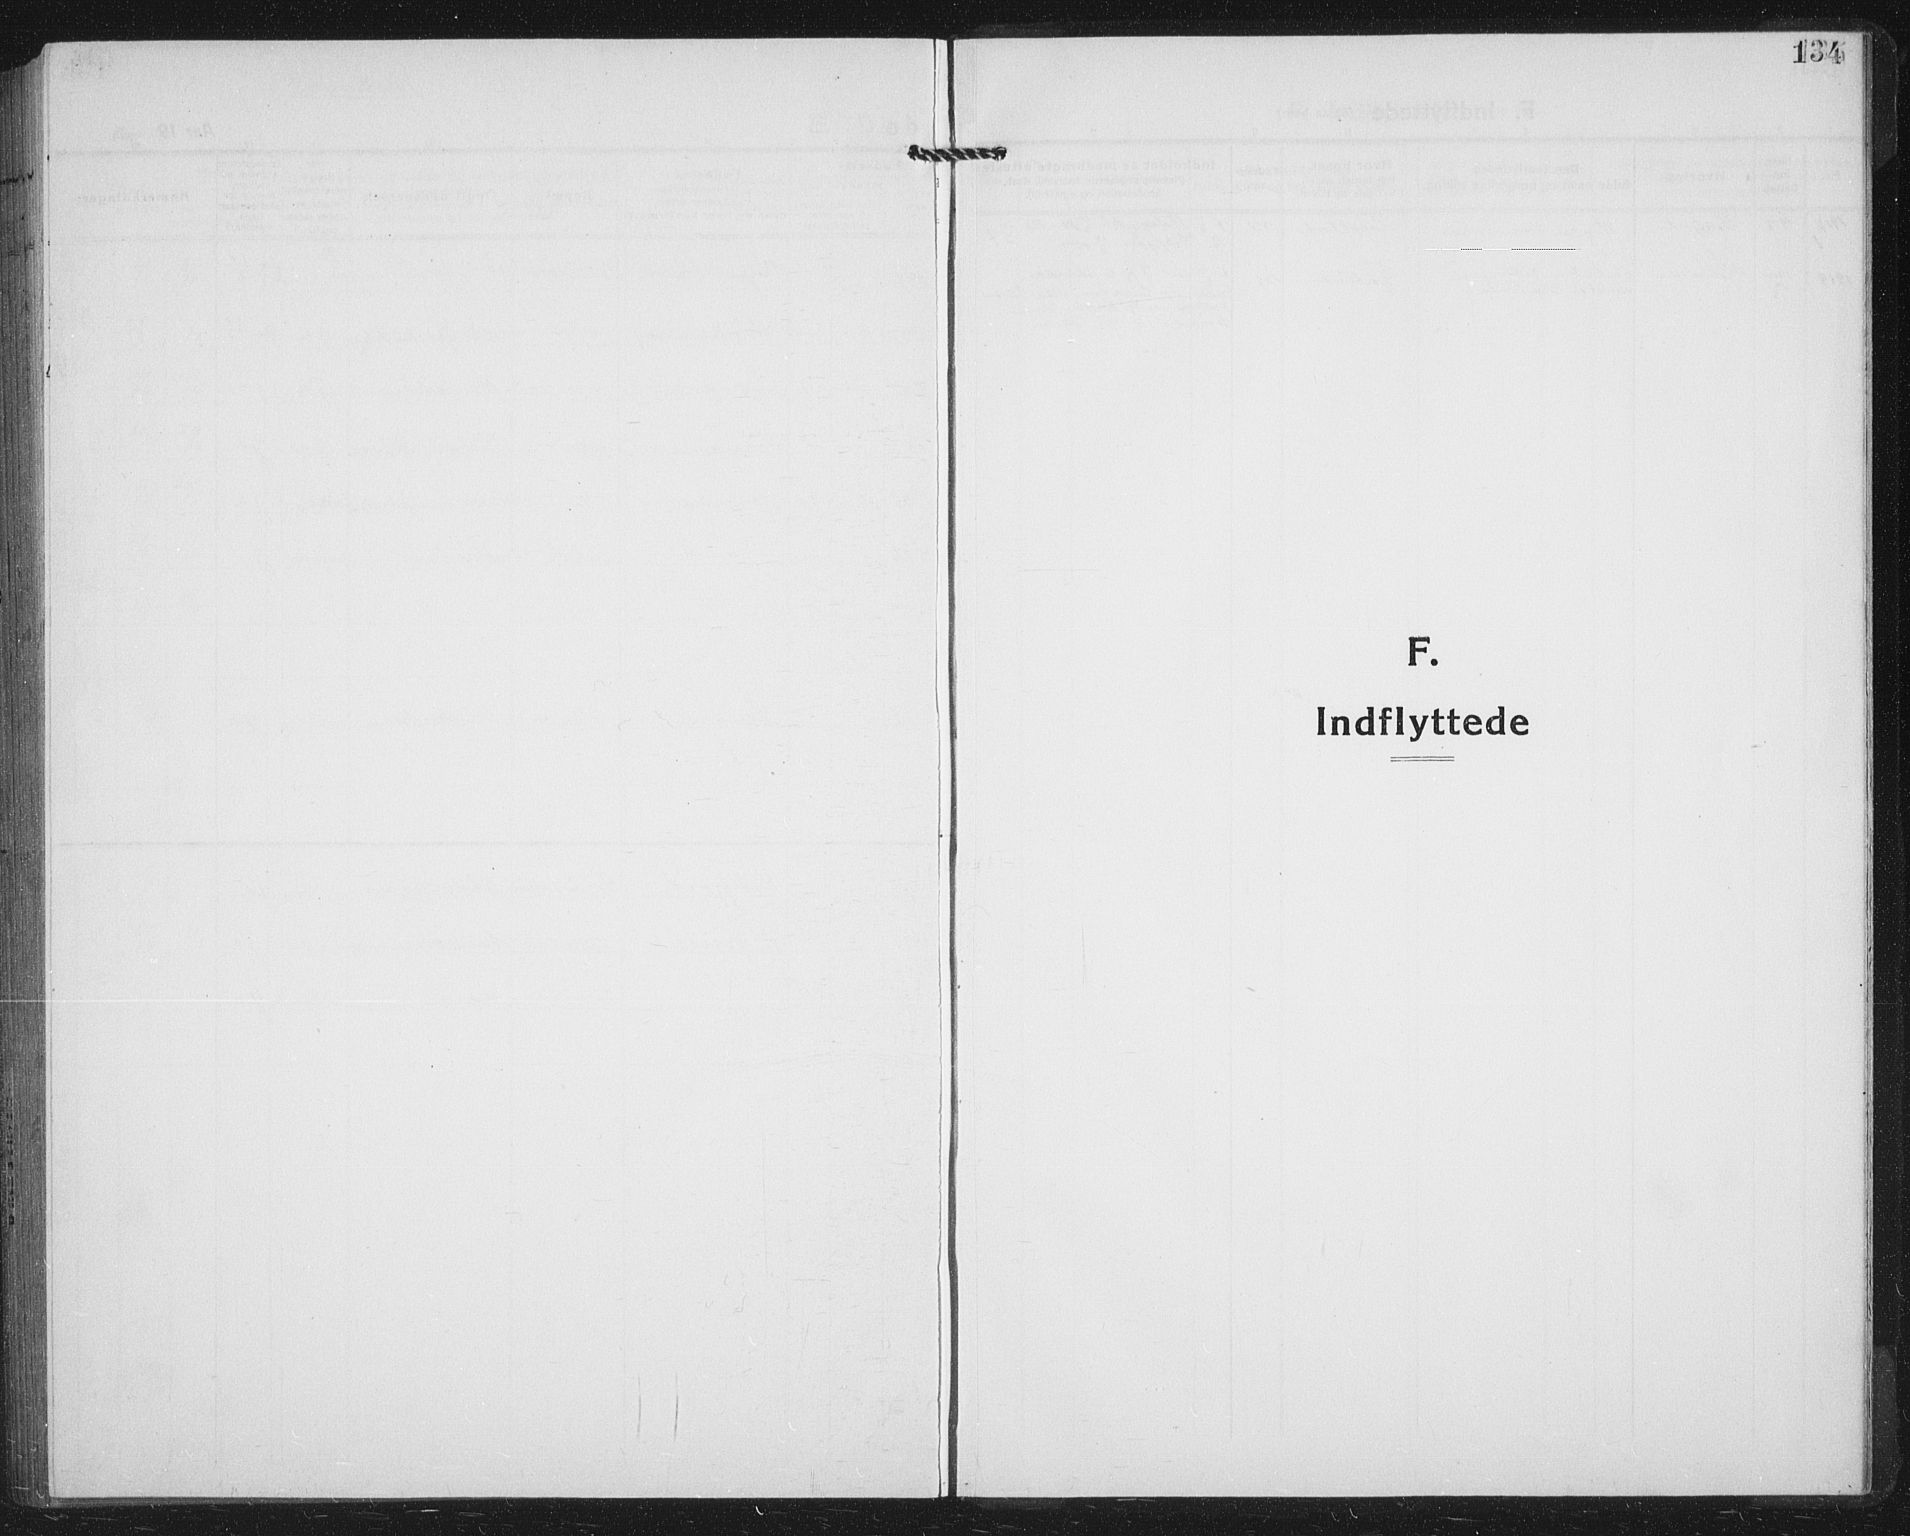 SATØ, Lenvik sokneprestembete, H/Ha/Hab/L0023klokker: Parish register (copy) no. 23, 1918-1936, p. 134